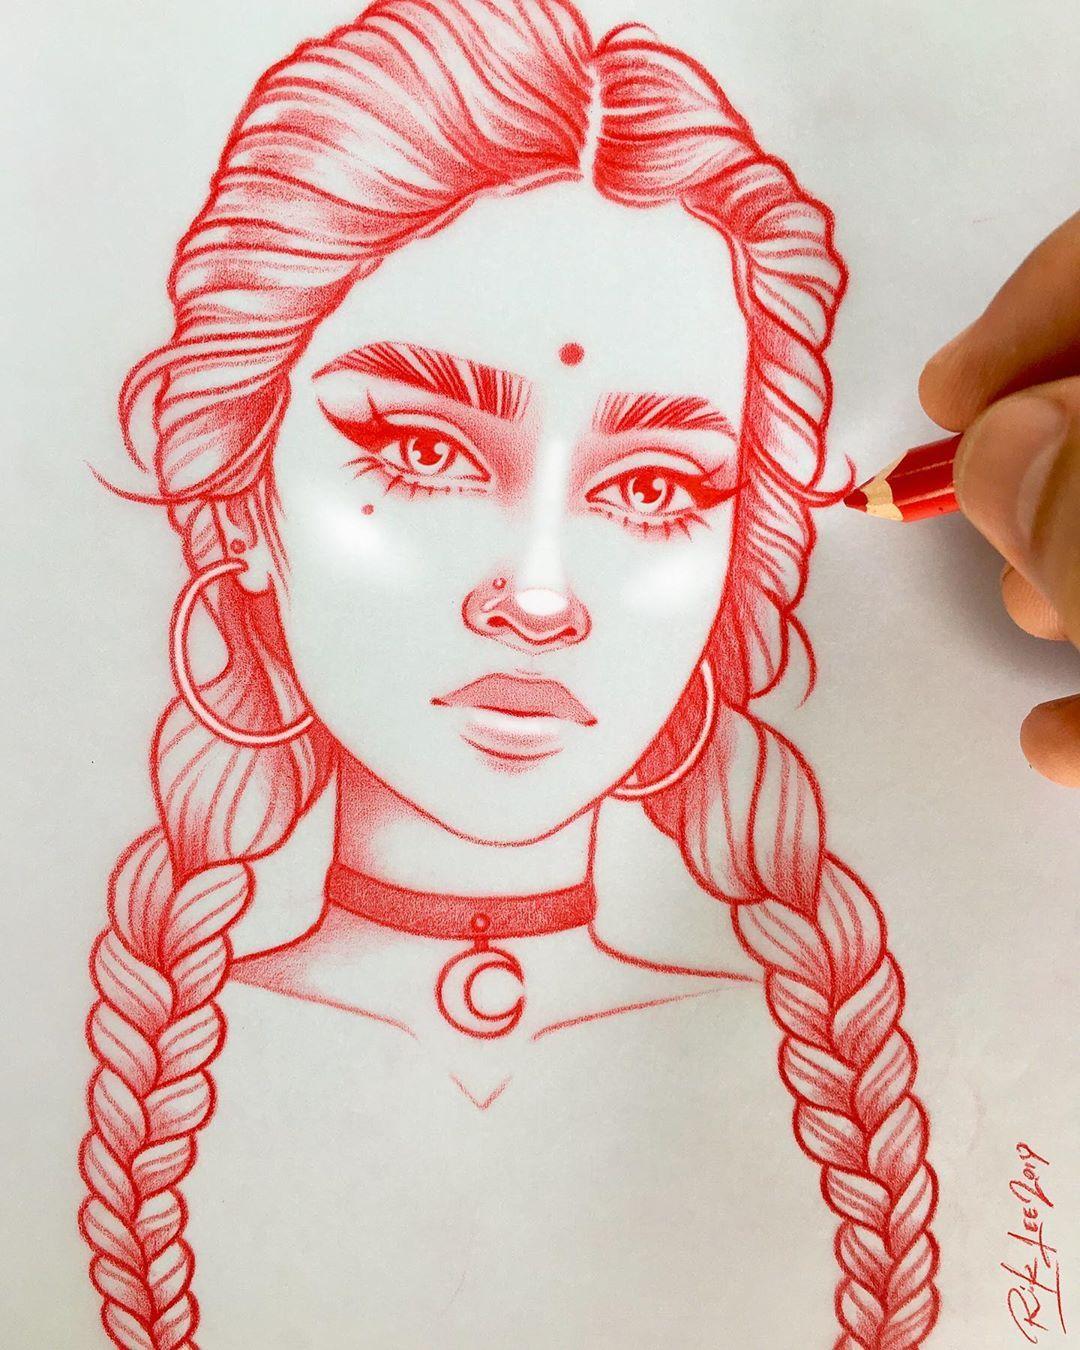 12 8 Mil Me Gusta 86 Comentarios Rik Lee Rikleeillustration En Instagram What S Your Favorite Faci In 2020 Cool Art Drawings Art Sketches Girl Drawing Sketches